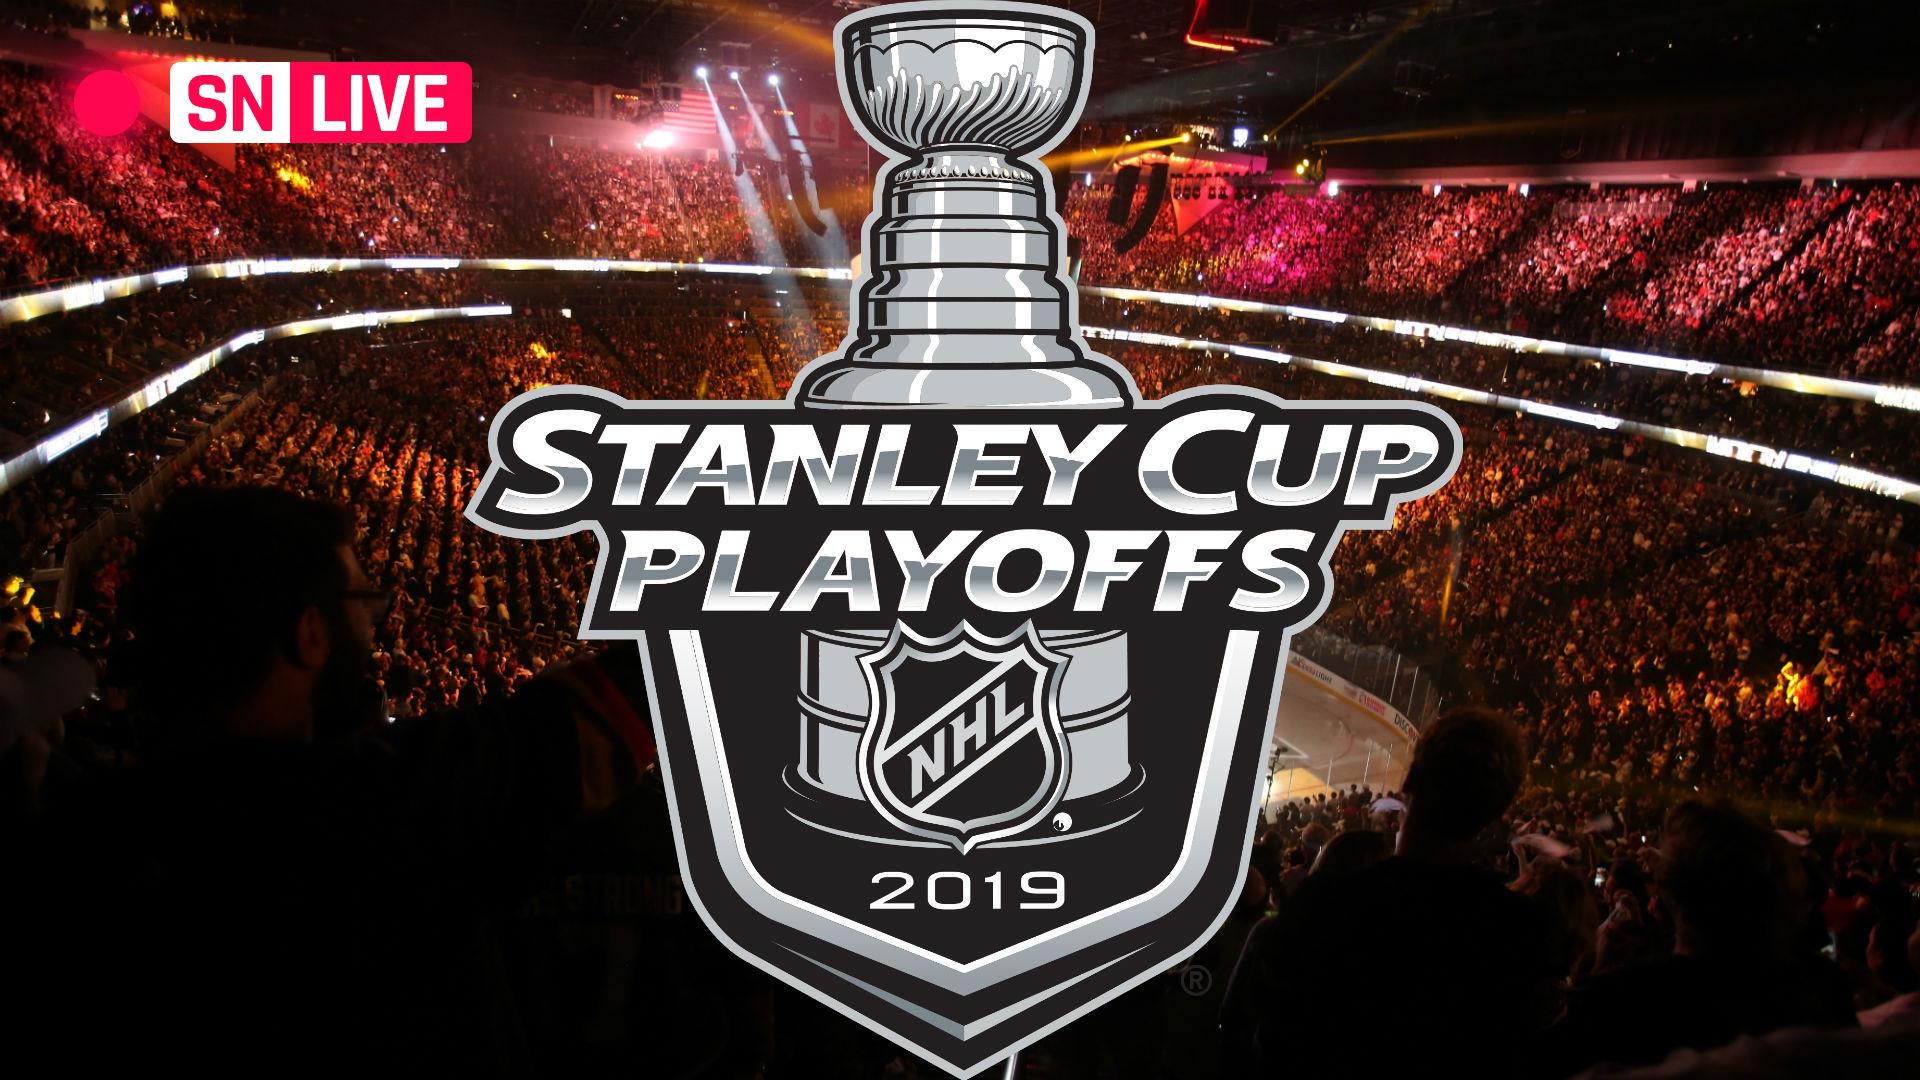 NHL playoffs today 2019 Live score TV schedule Game 7 updates 1920x1080